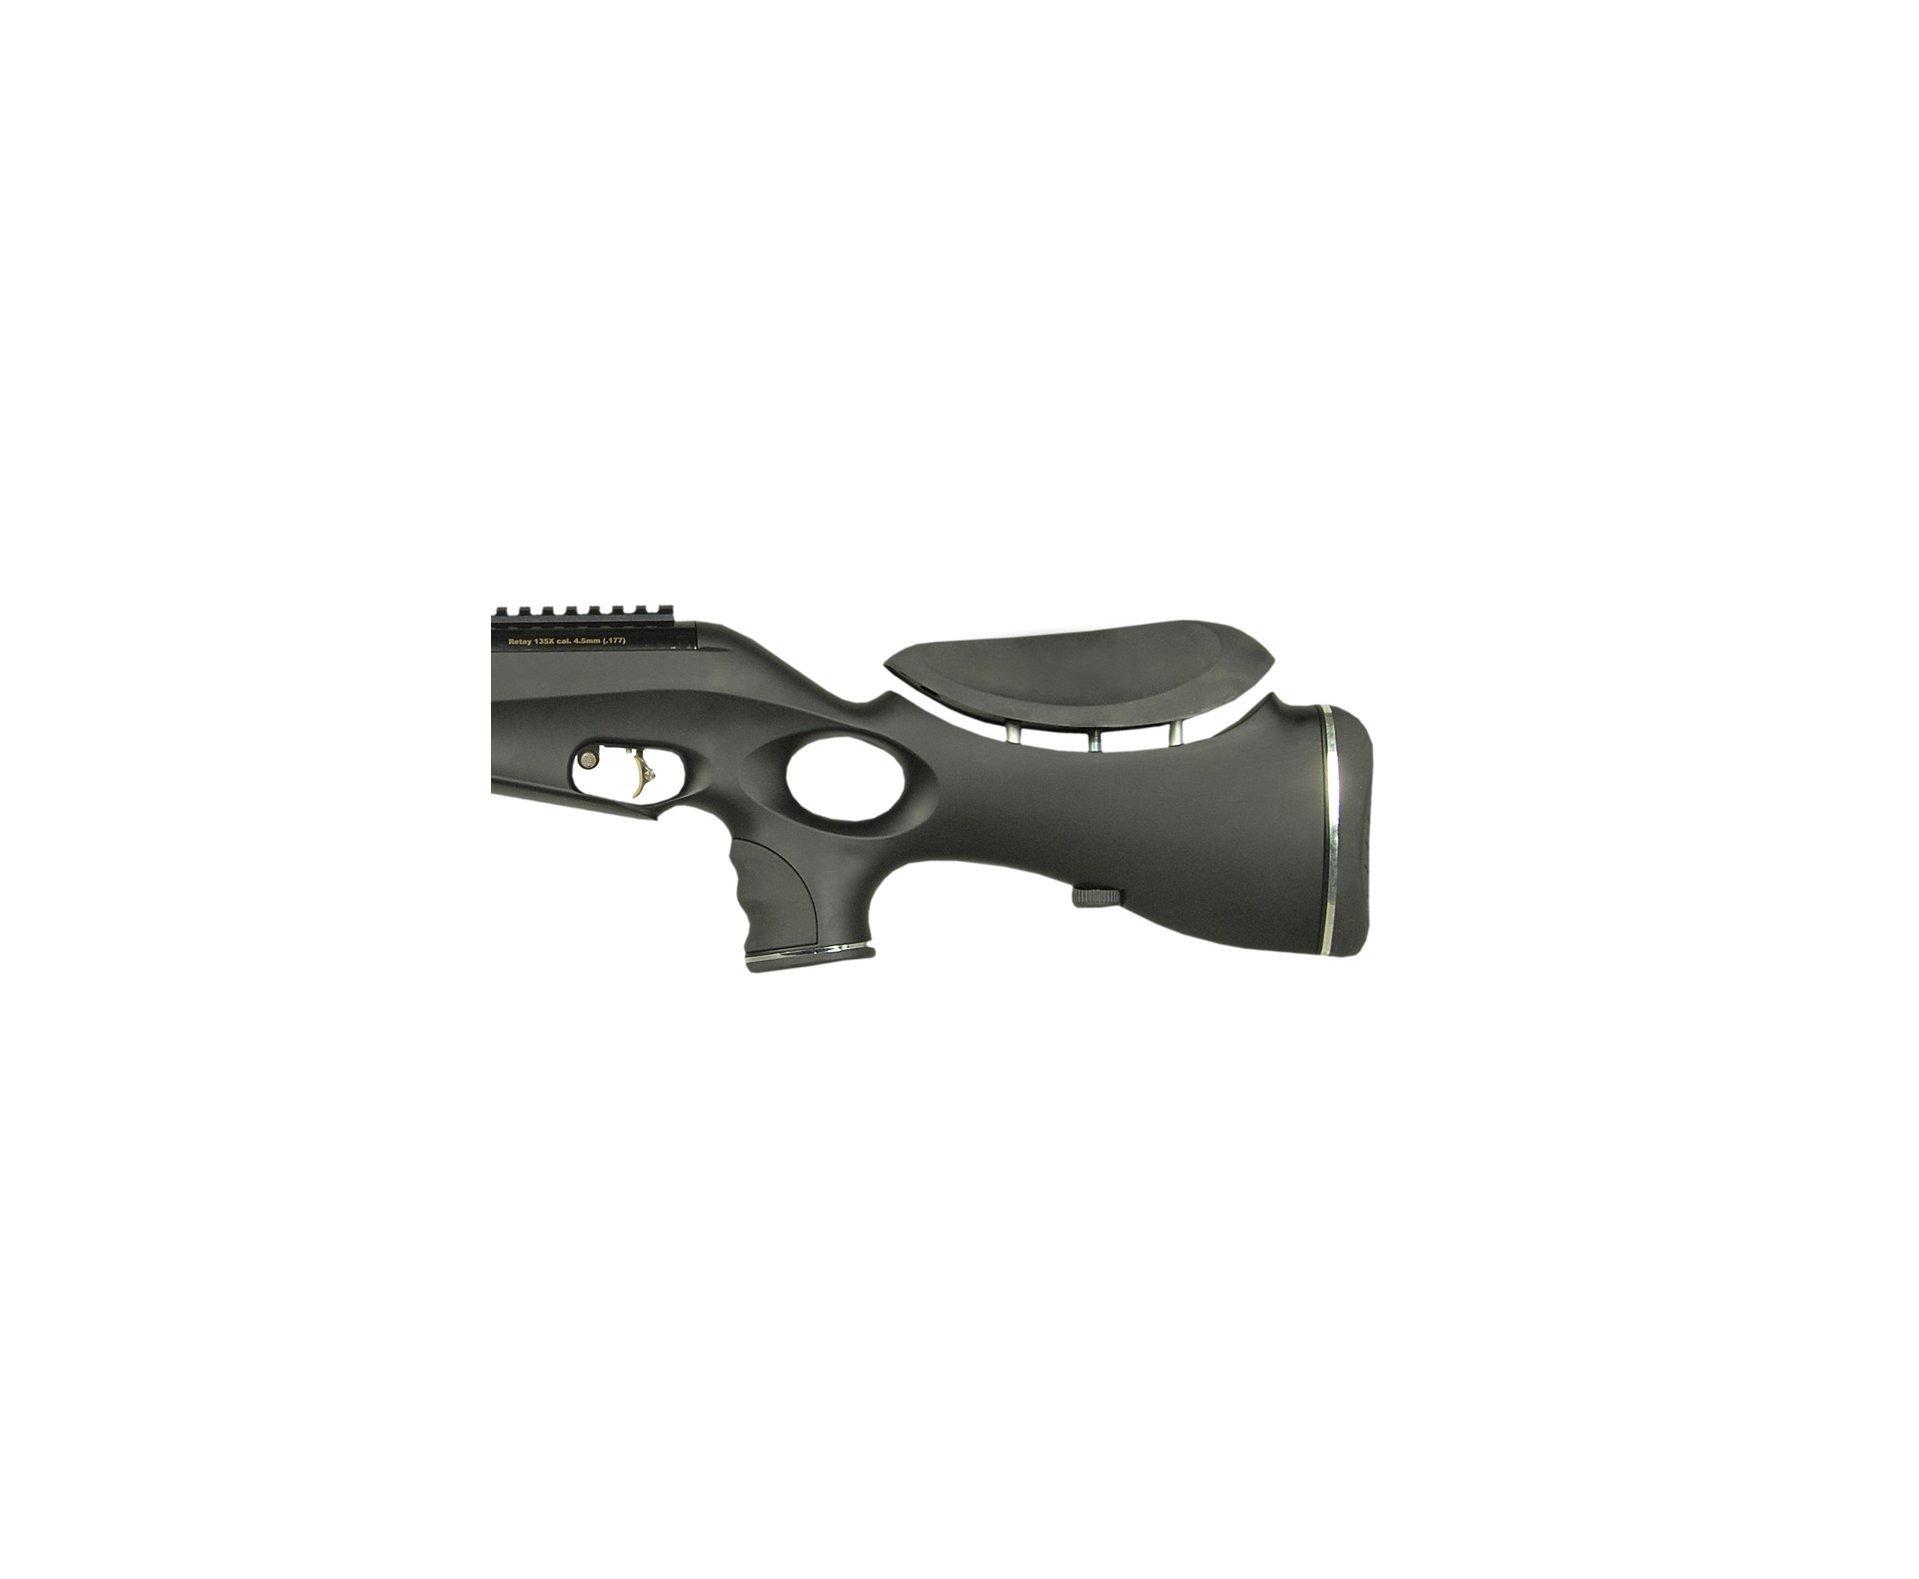 Carabina De Pressão Mod 135x Black - Calibre 5,5 Mm - Retay